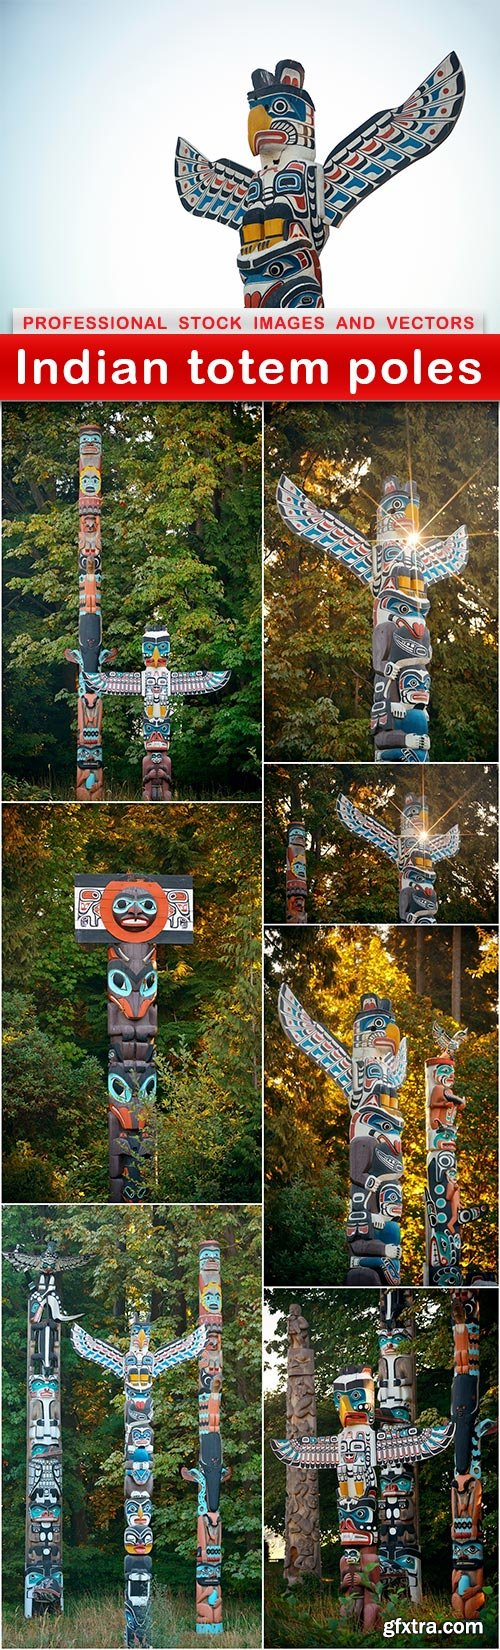 Indian totem poles - 8 UHQ JPEG